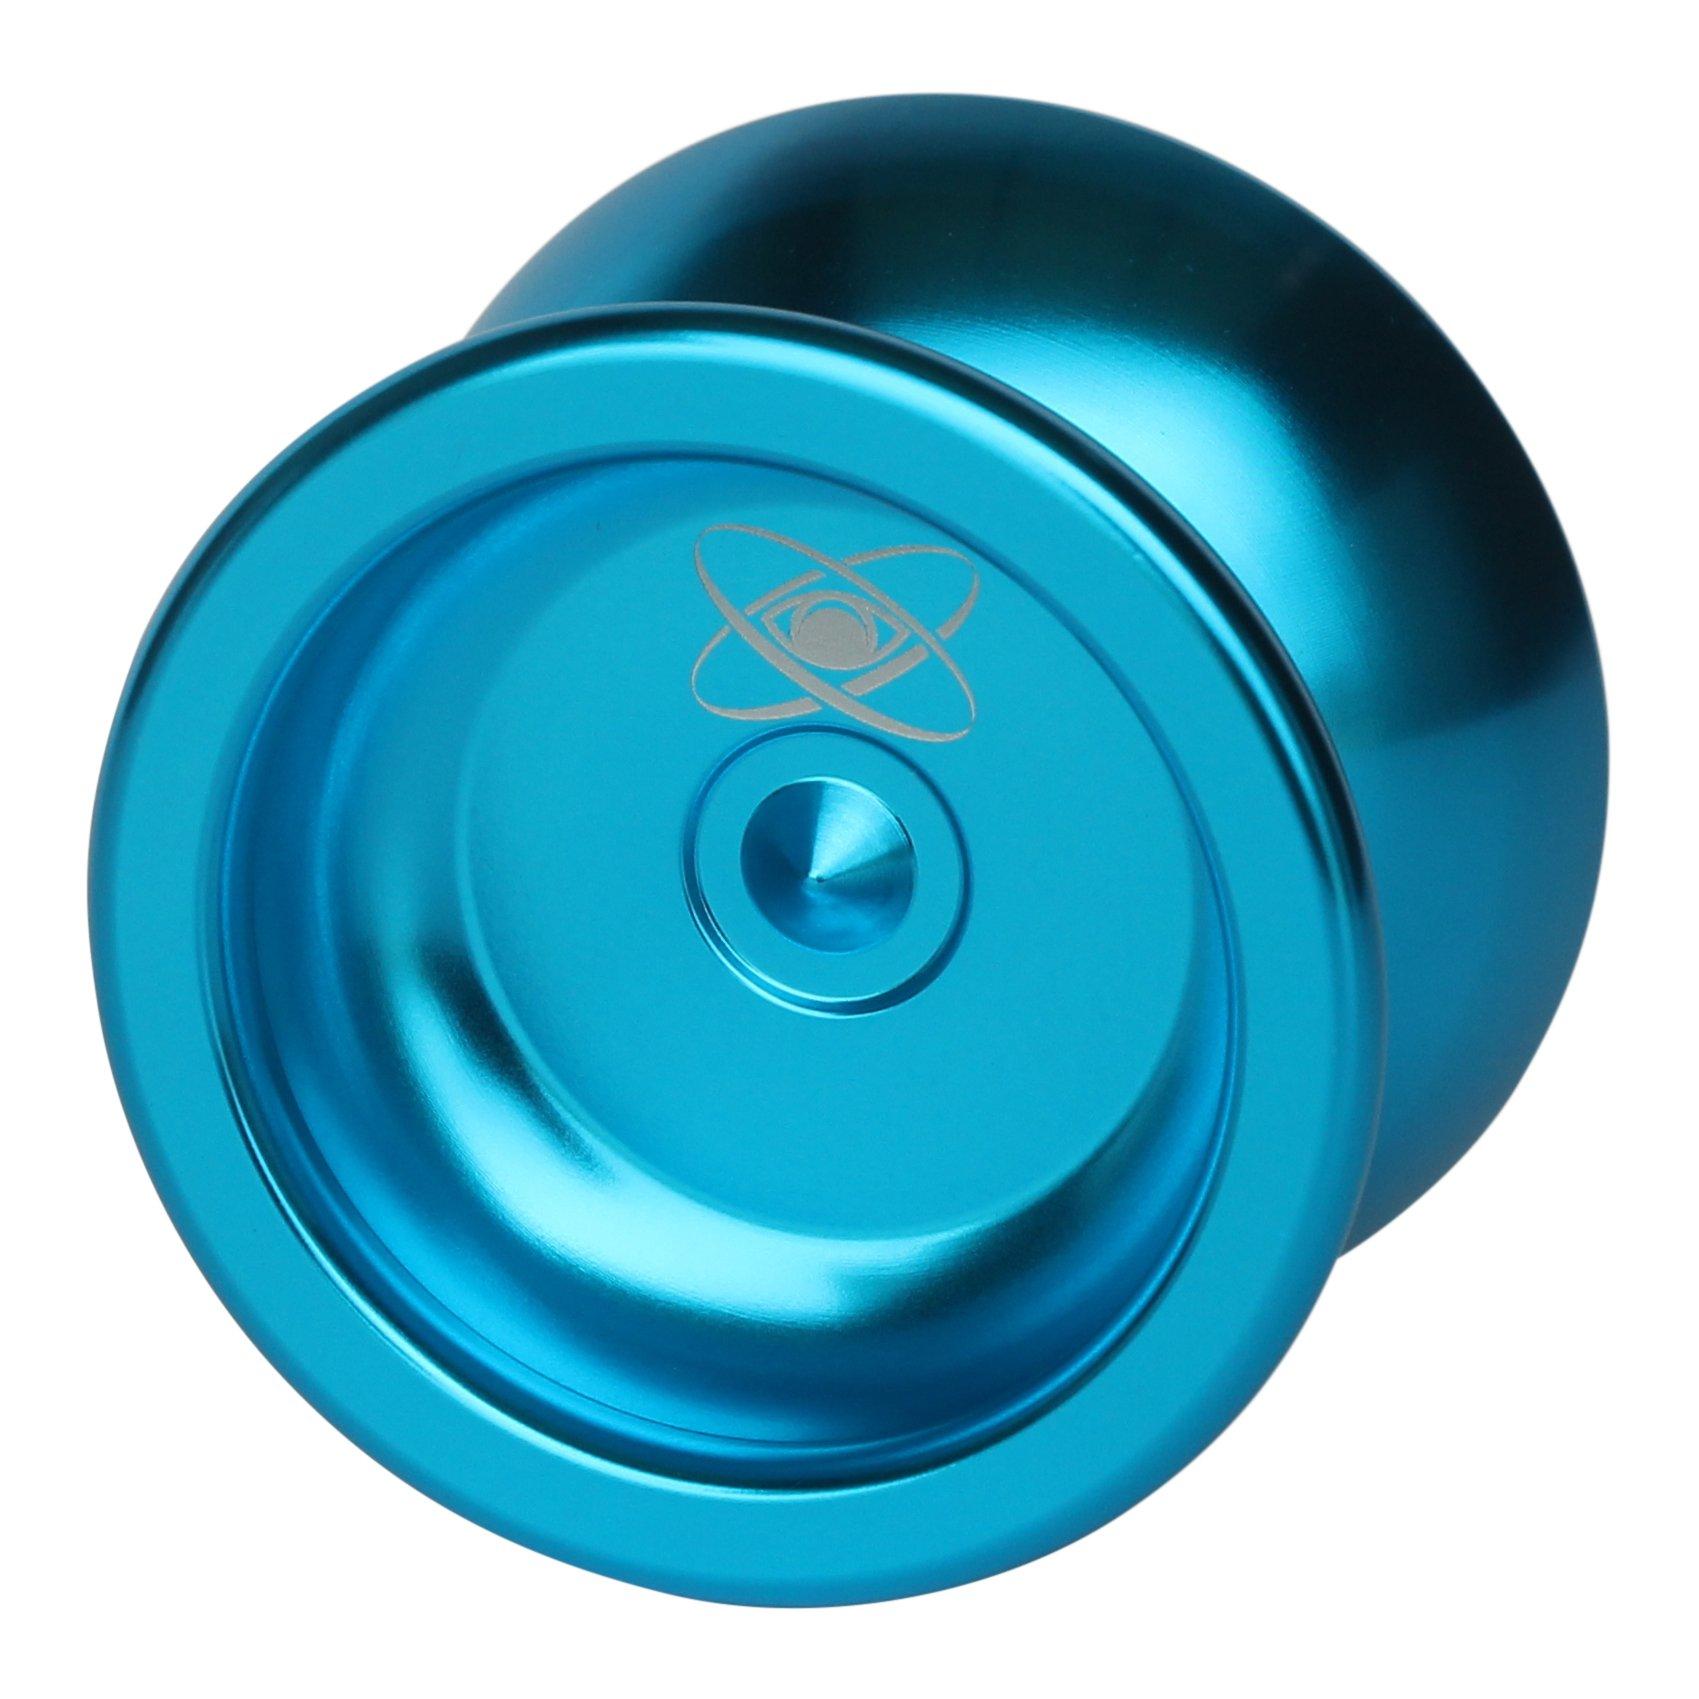 Yoyo King Watcher Metal Professional Yoyo with Ball Bearing Axle and Extra String Metallic Blue by Yoyo King